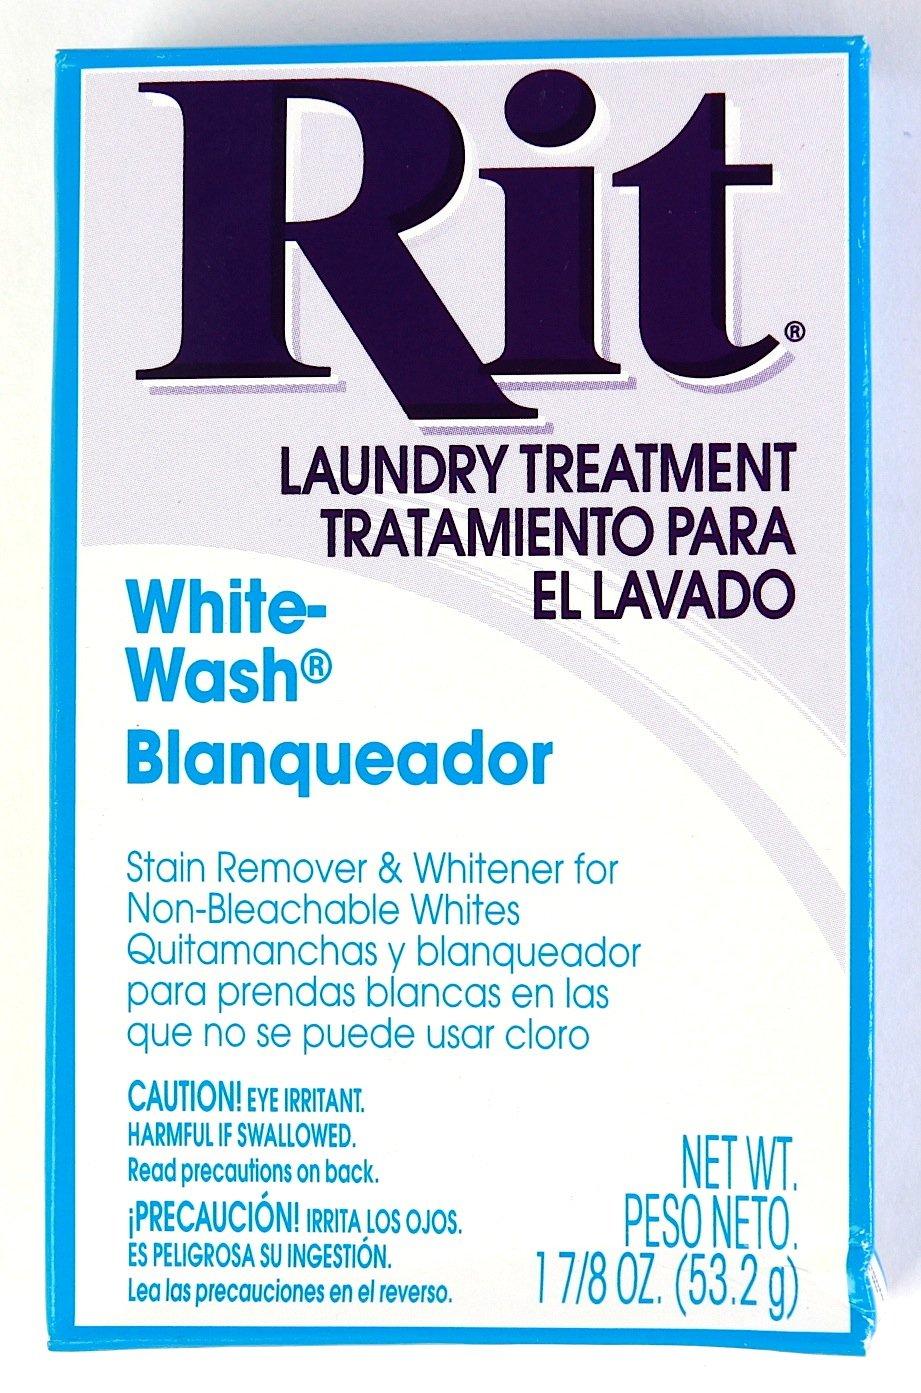 Rit Dye Laundry Treatment White-wash Stain Remover and Whitener Powder, 1-7/8 oz, White, 3-Pack